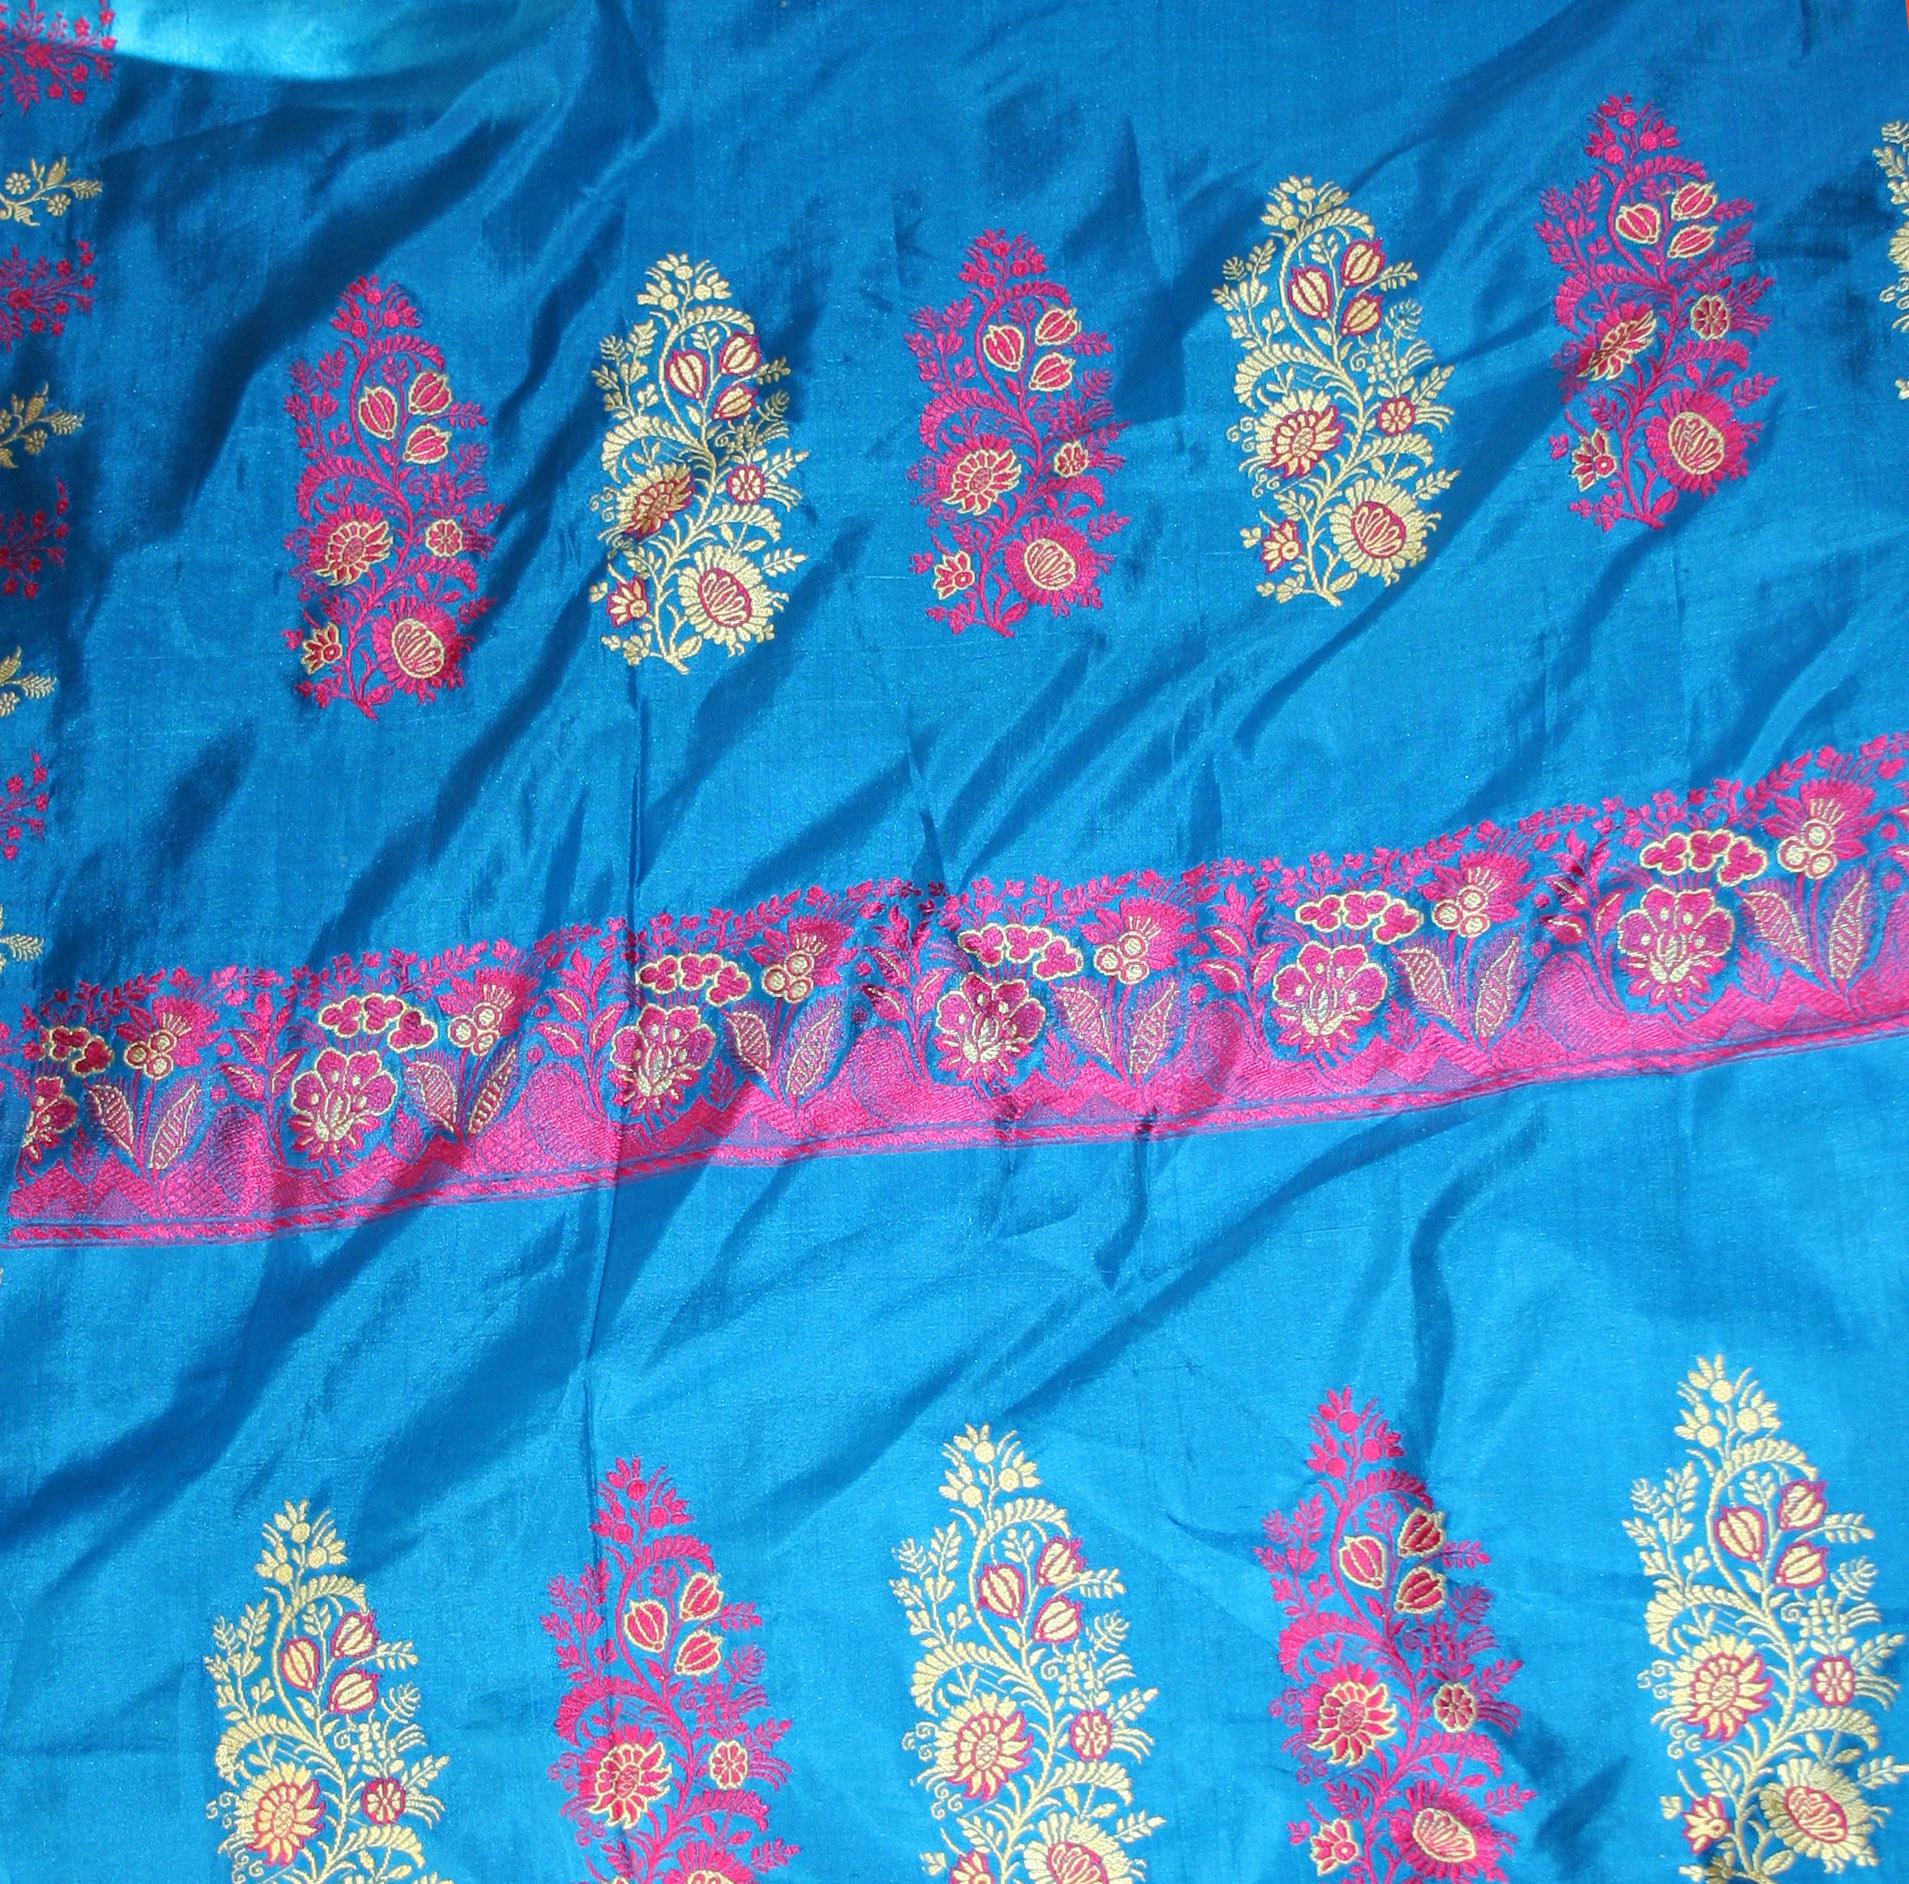 Sari Fabric 3 by Falln-Stock on DeviantArt